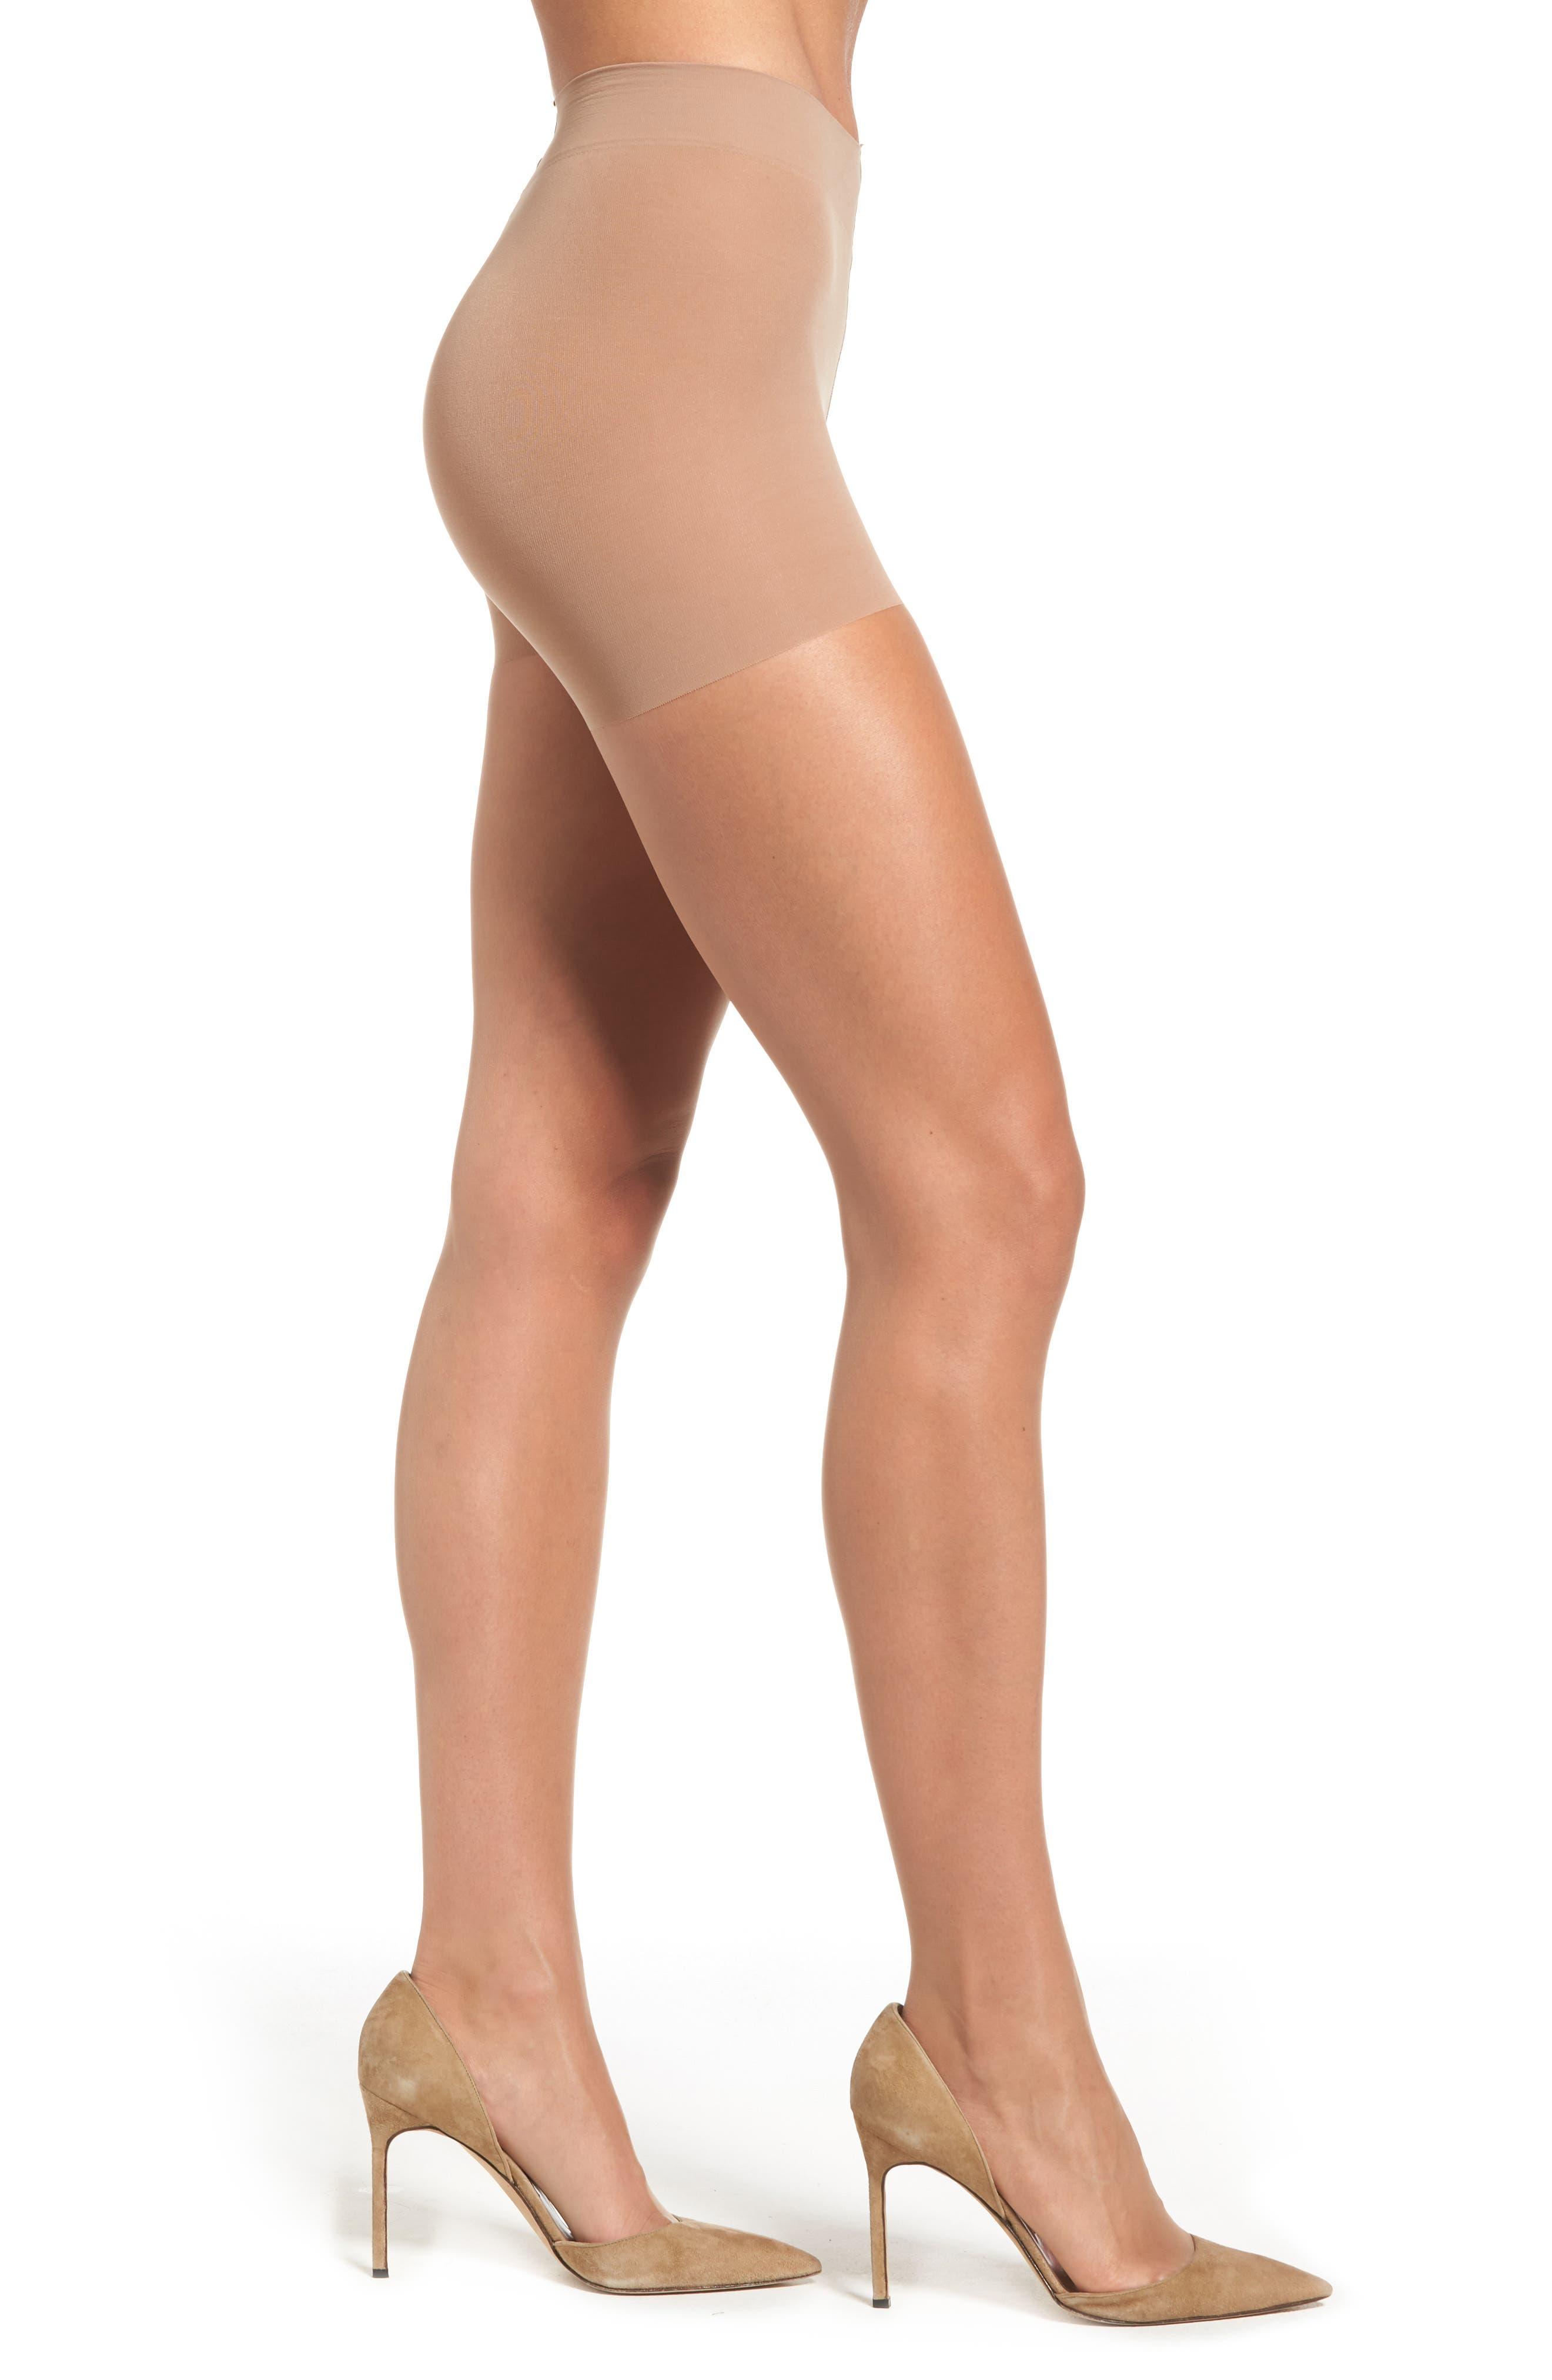 Perfect Nudes Pantyhose,                         Main,                         color, BEIGE/ NUDE